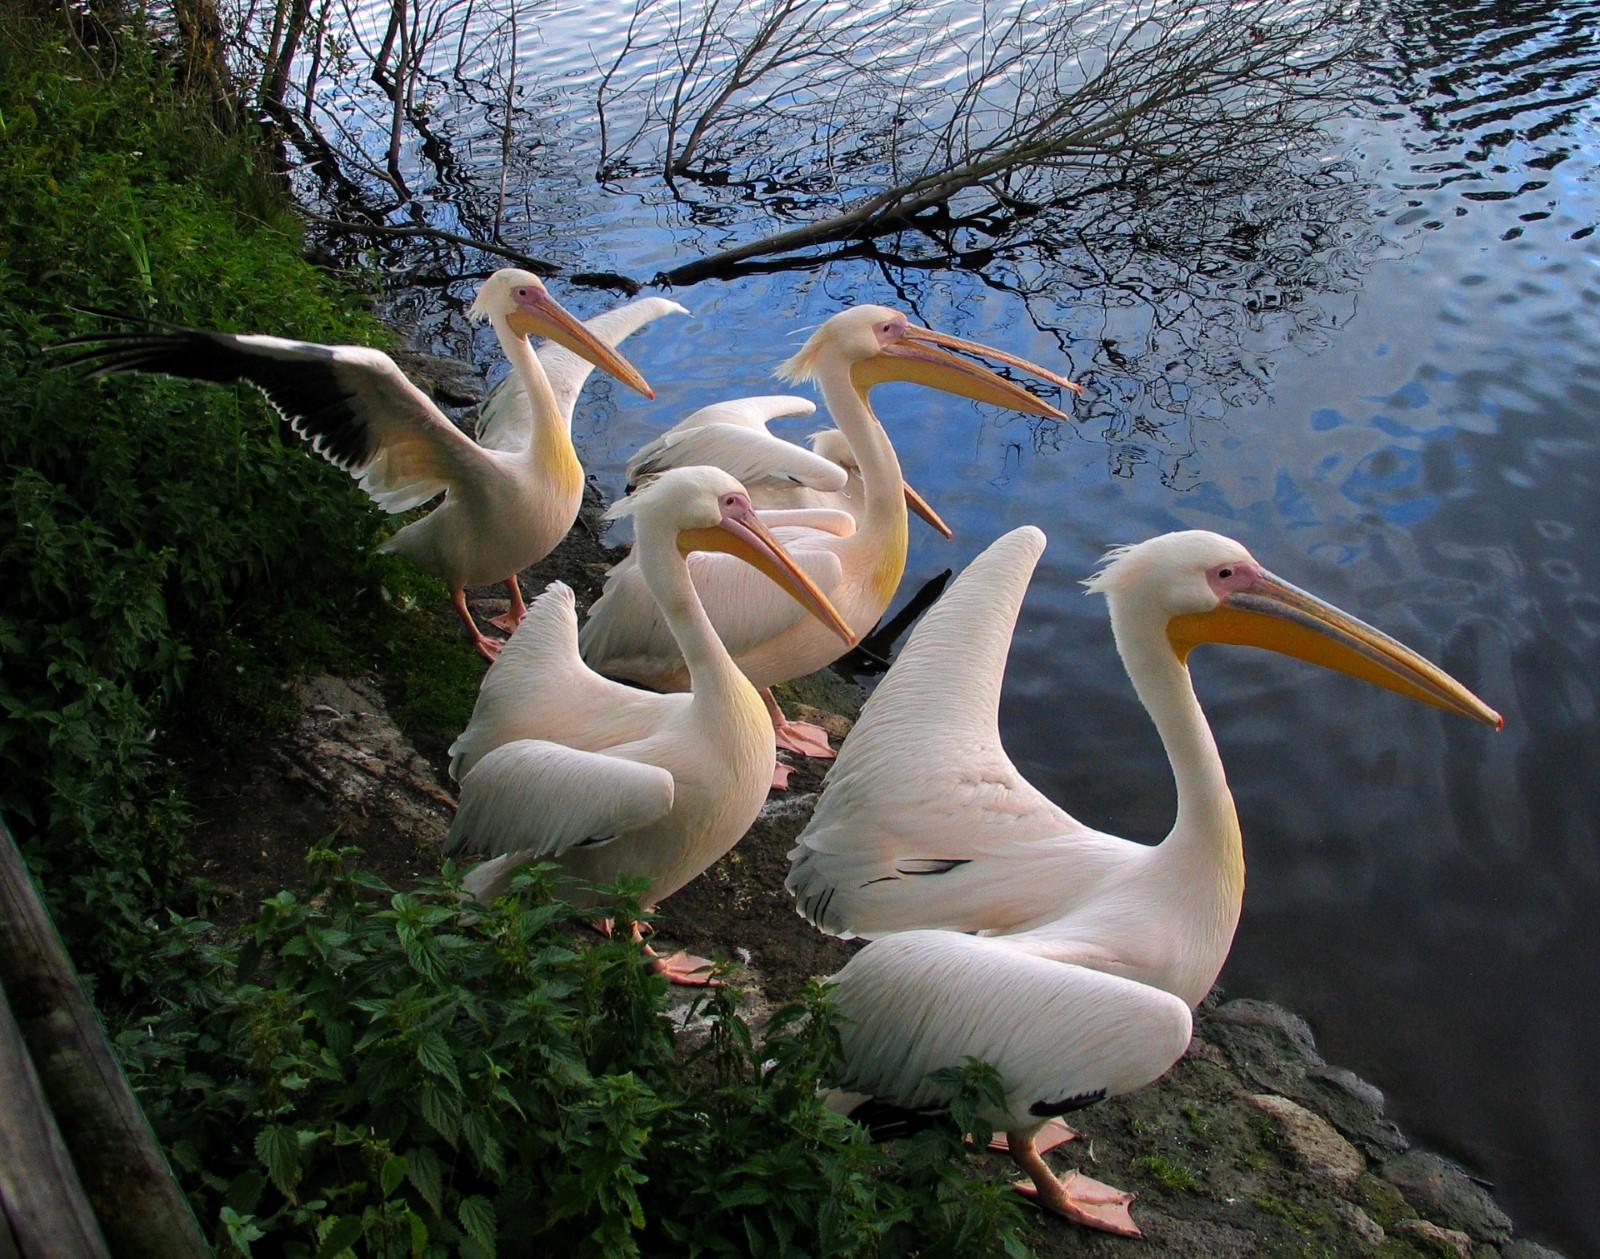 zofo-2014-pelikanid-foto-aleksander-kuzovlev